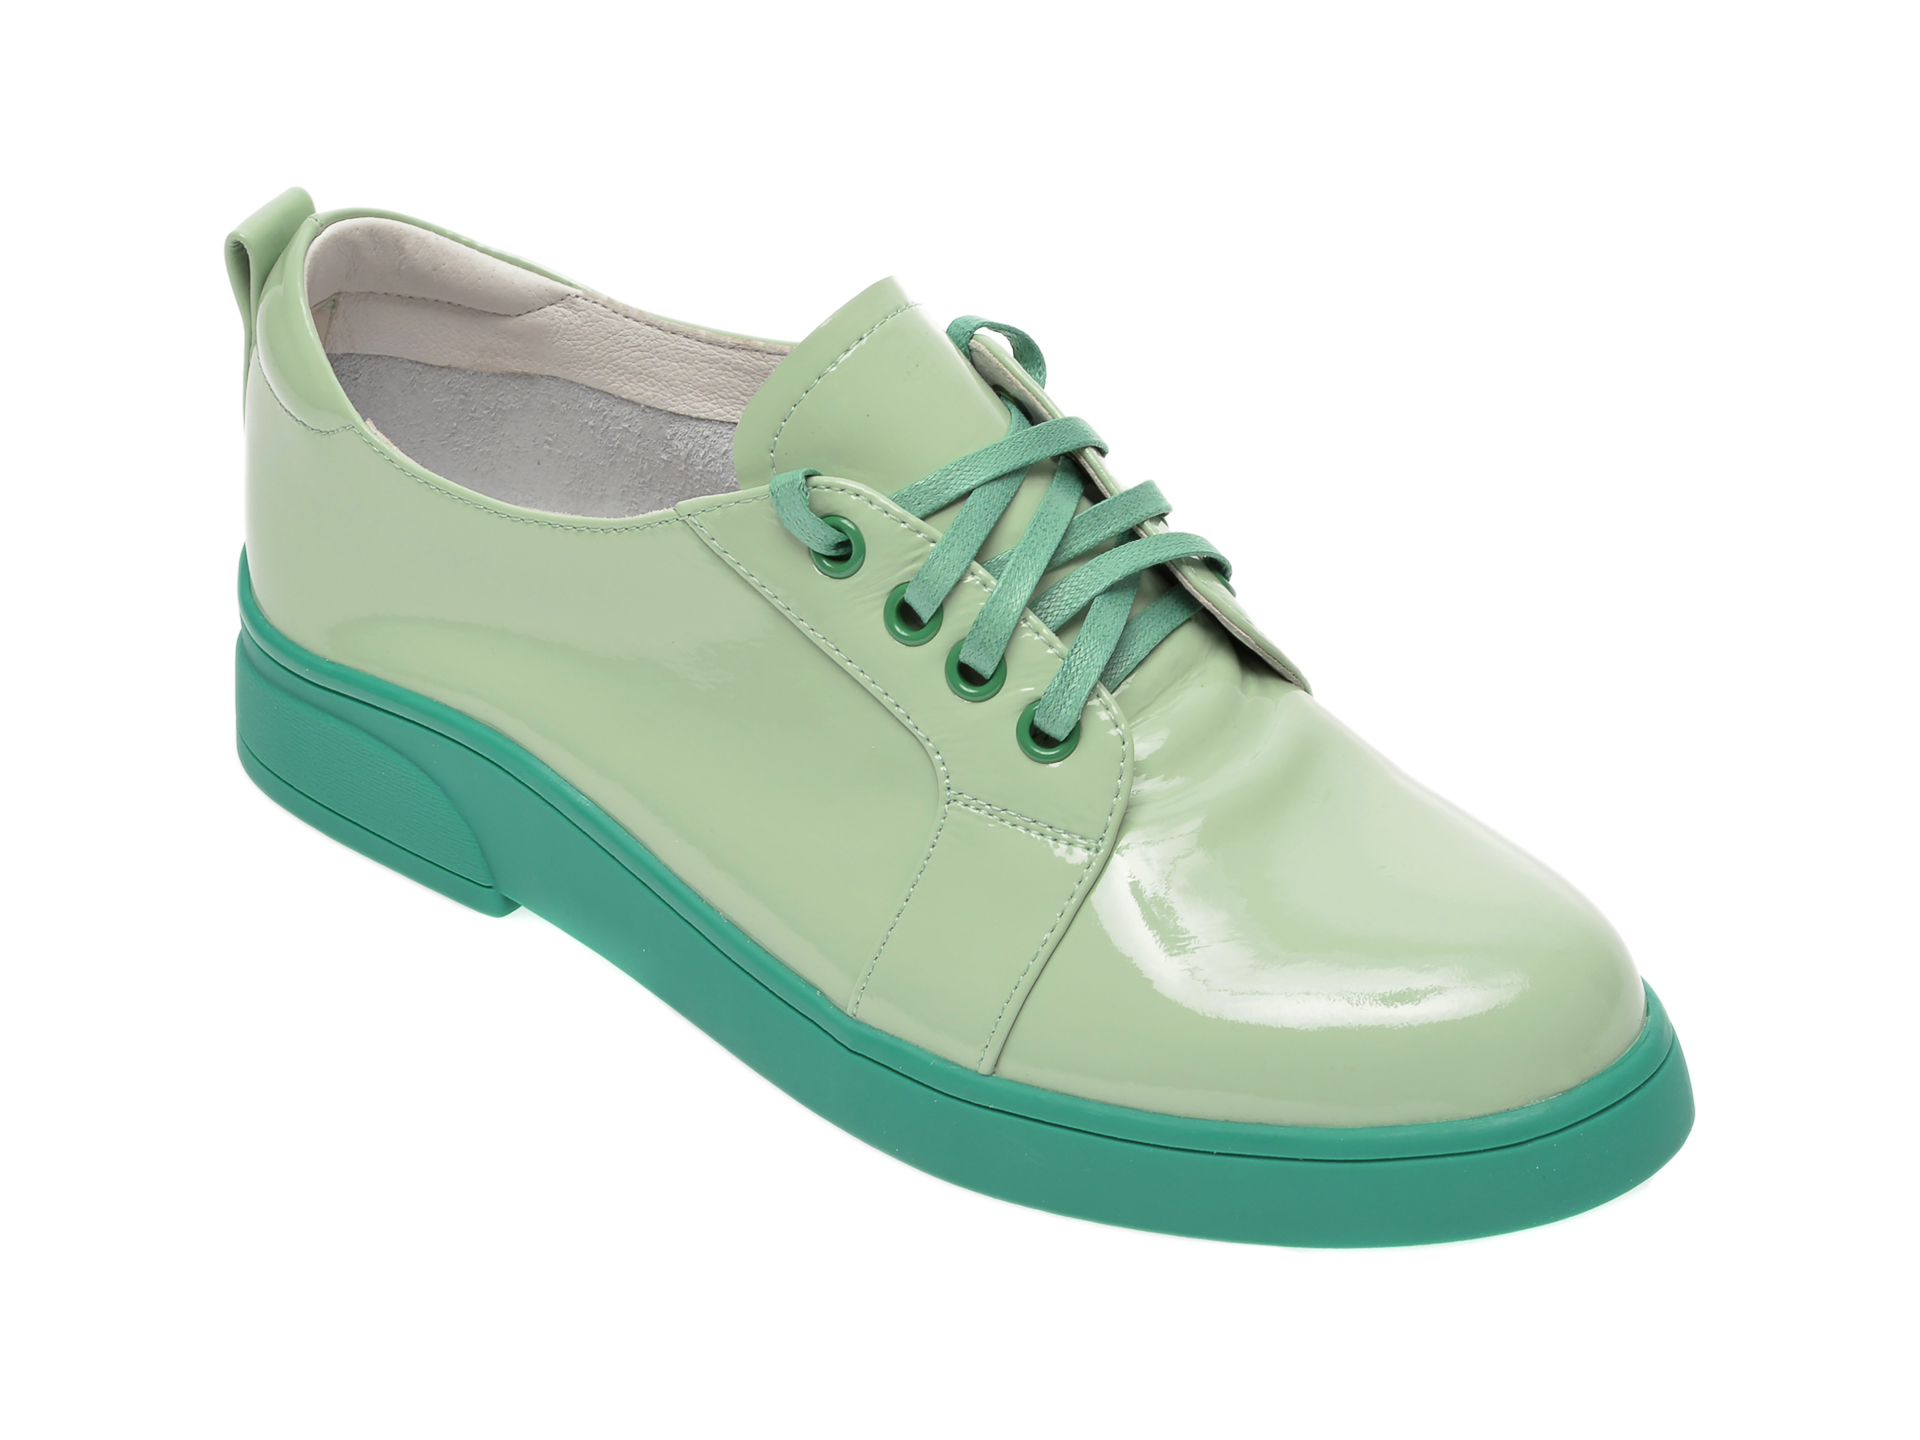 Pantofi FLAVIA PASSINI verzi, FH92256, din piele naturala lacuita